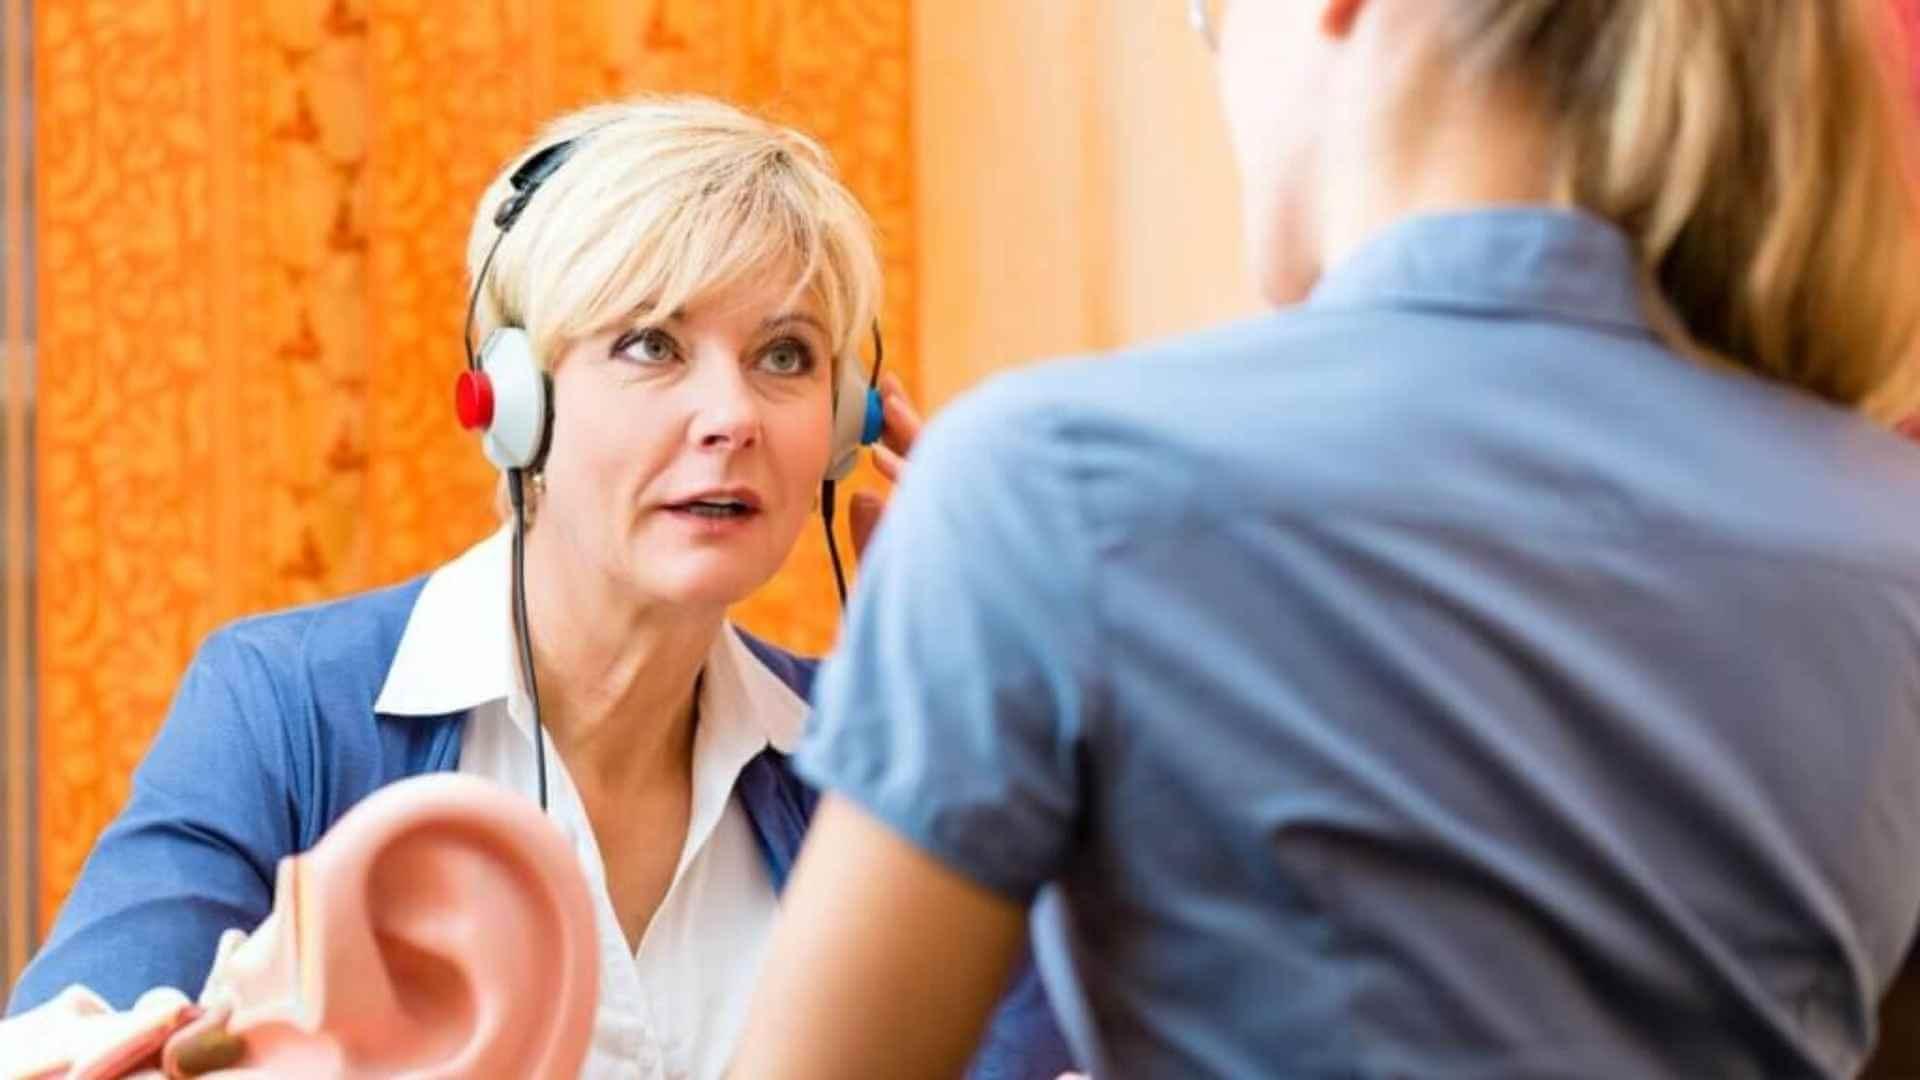 perda auditiva neurossensorial